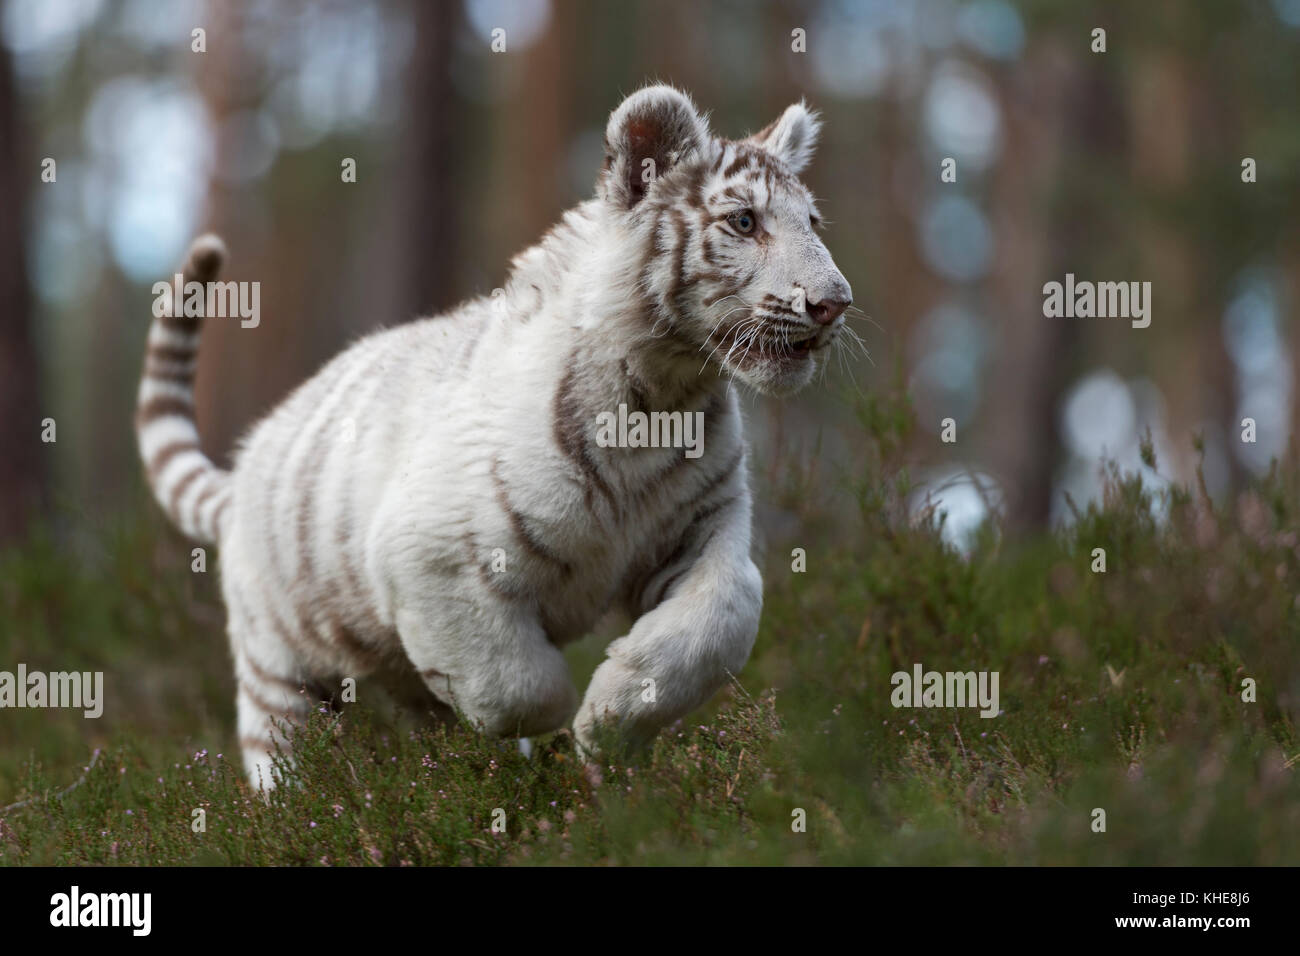 Royal Bengal Tiger / Koenigstiger ( Panthera tigris ), young, white animal, running fast, jumping through the undergrowth - Stock Image